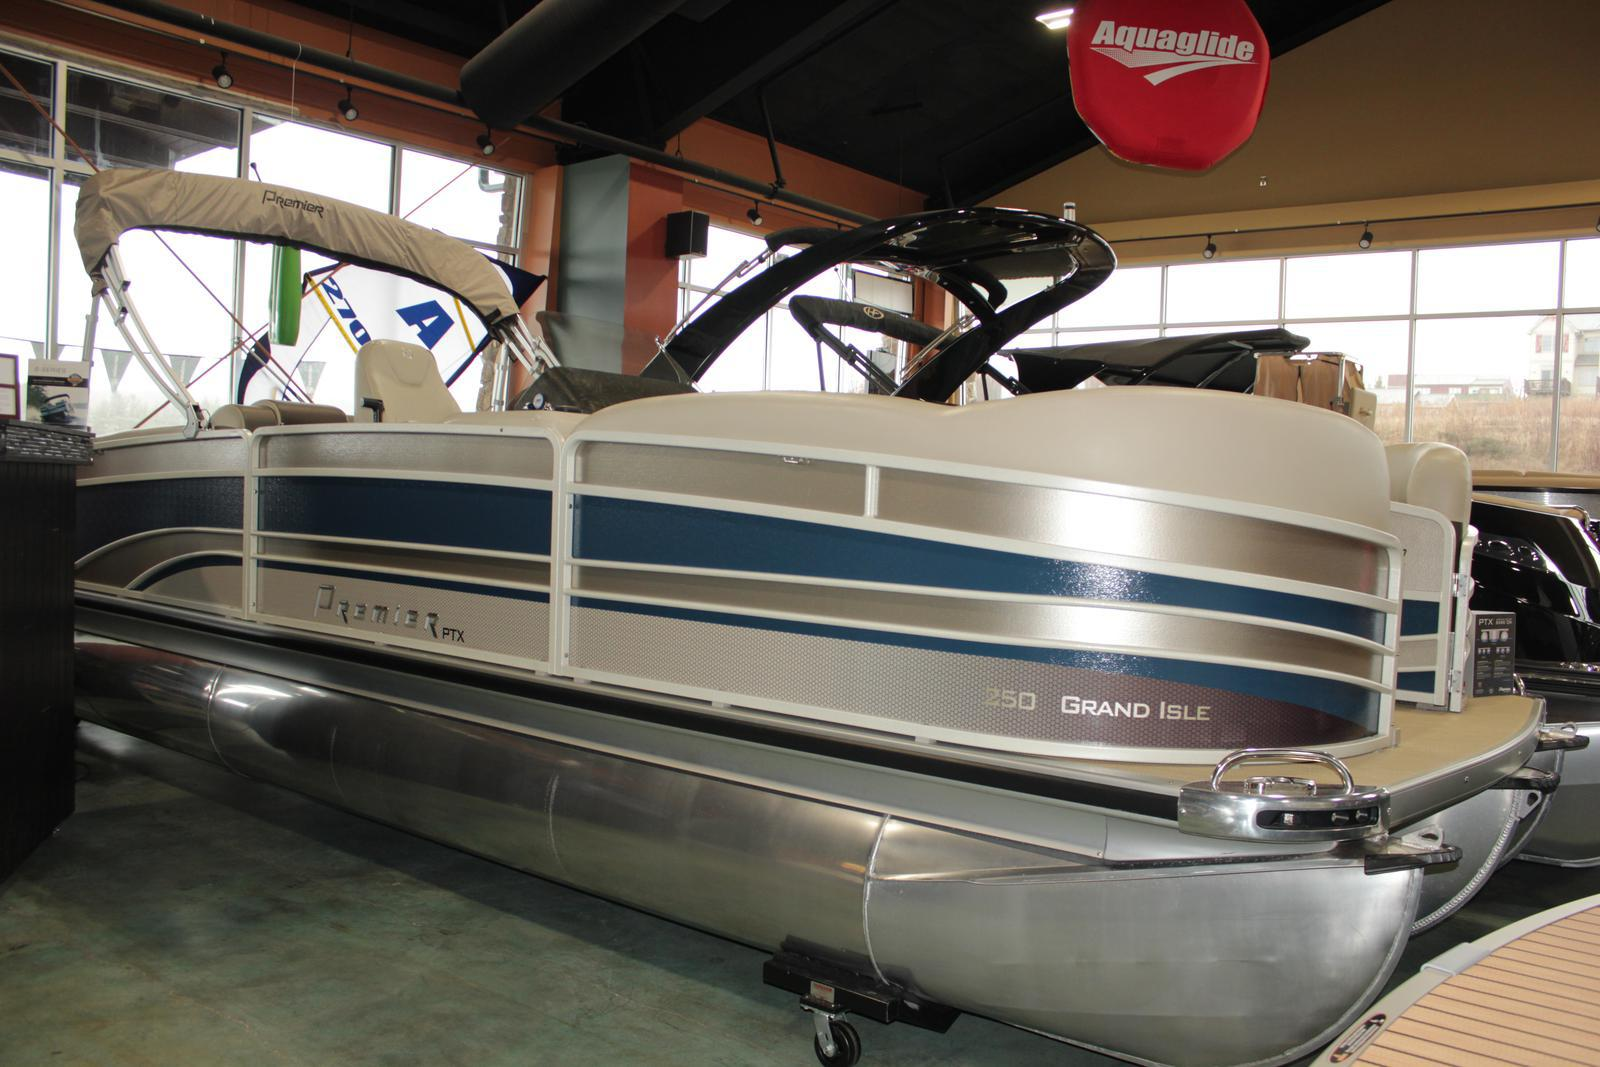 Premier 250 Grand Isle SL